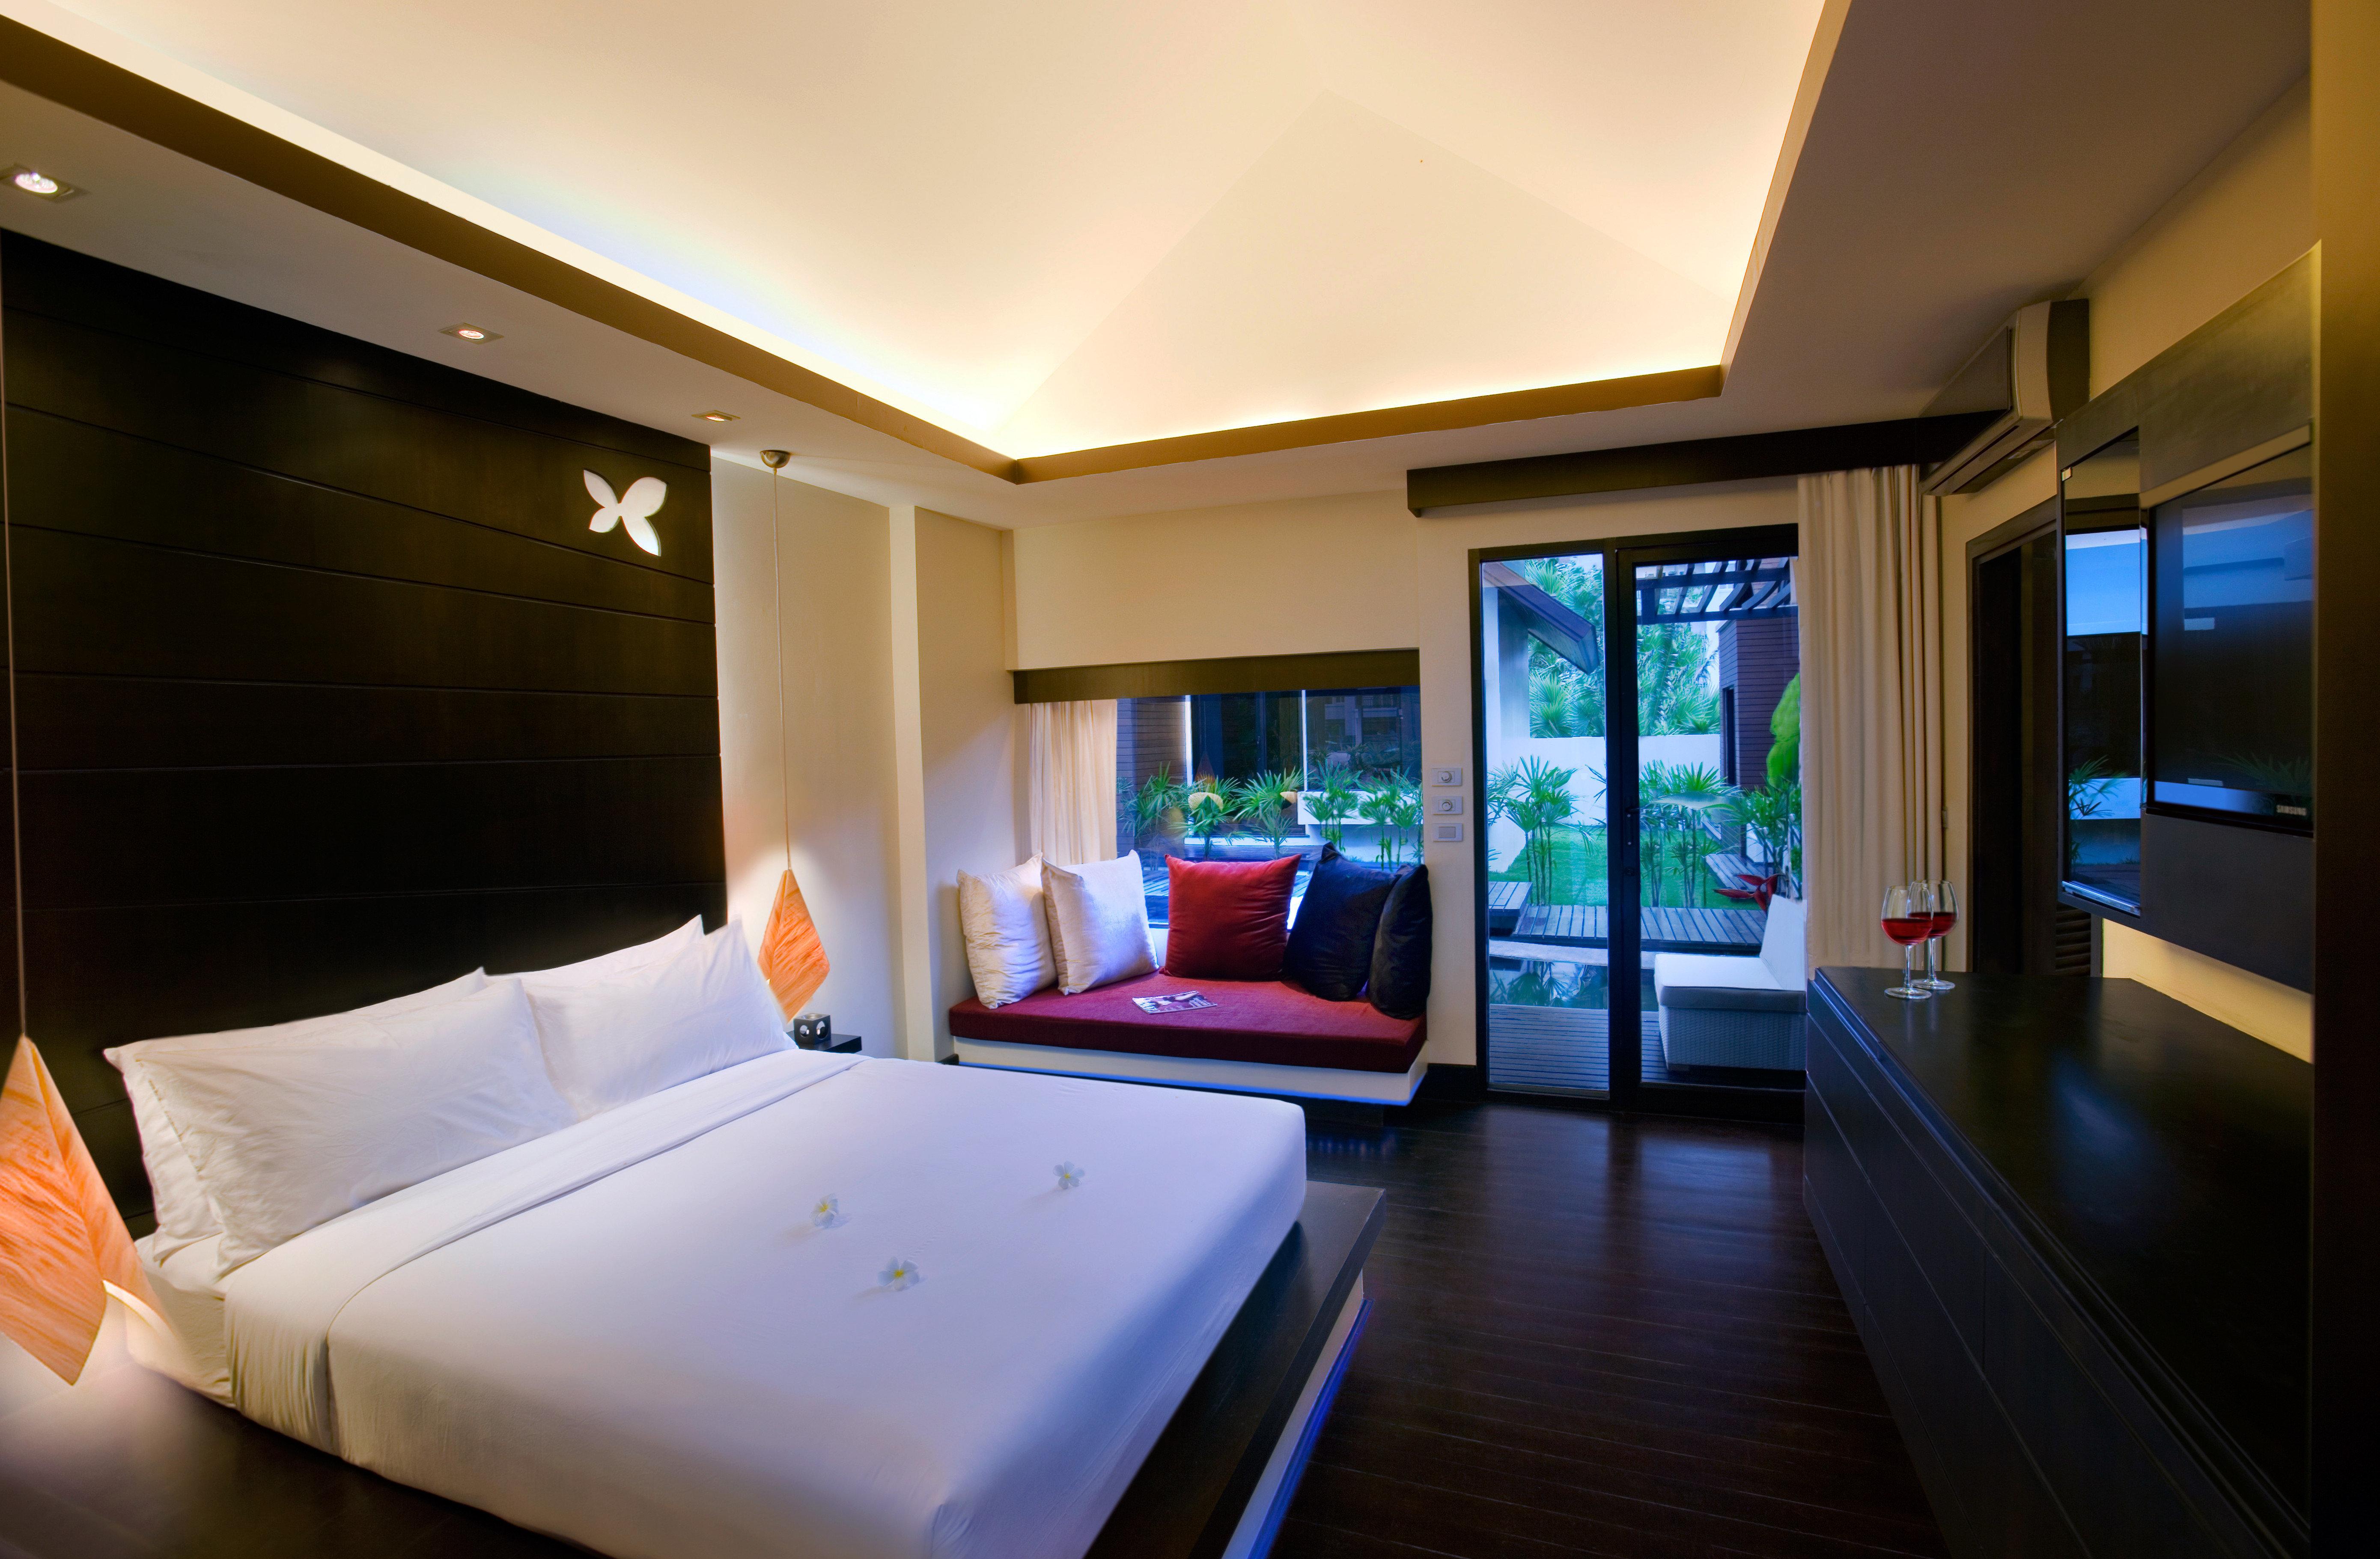 Bedroom Elegant Hip Luxury Modern Scenic views Suite property Resort condominium home living room recreation room